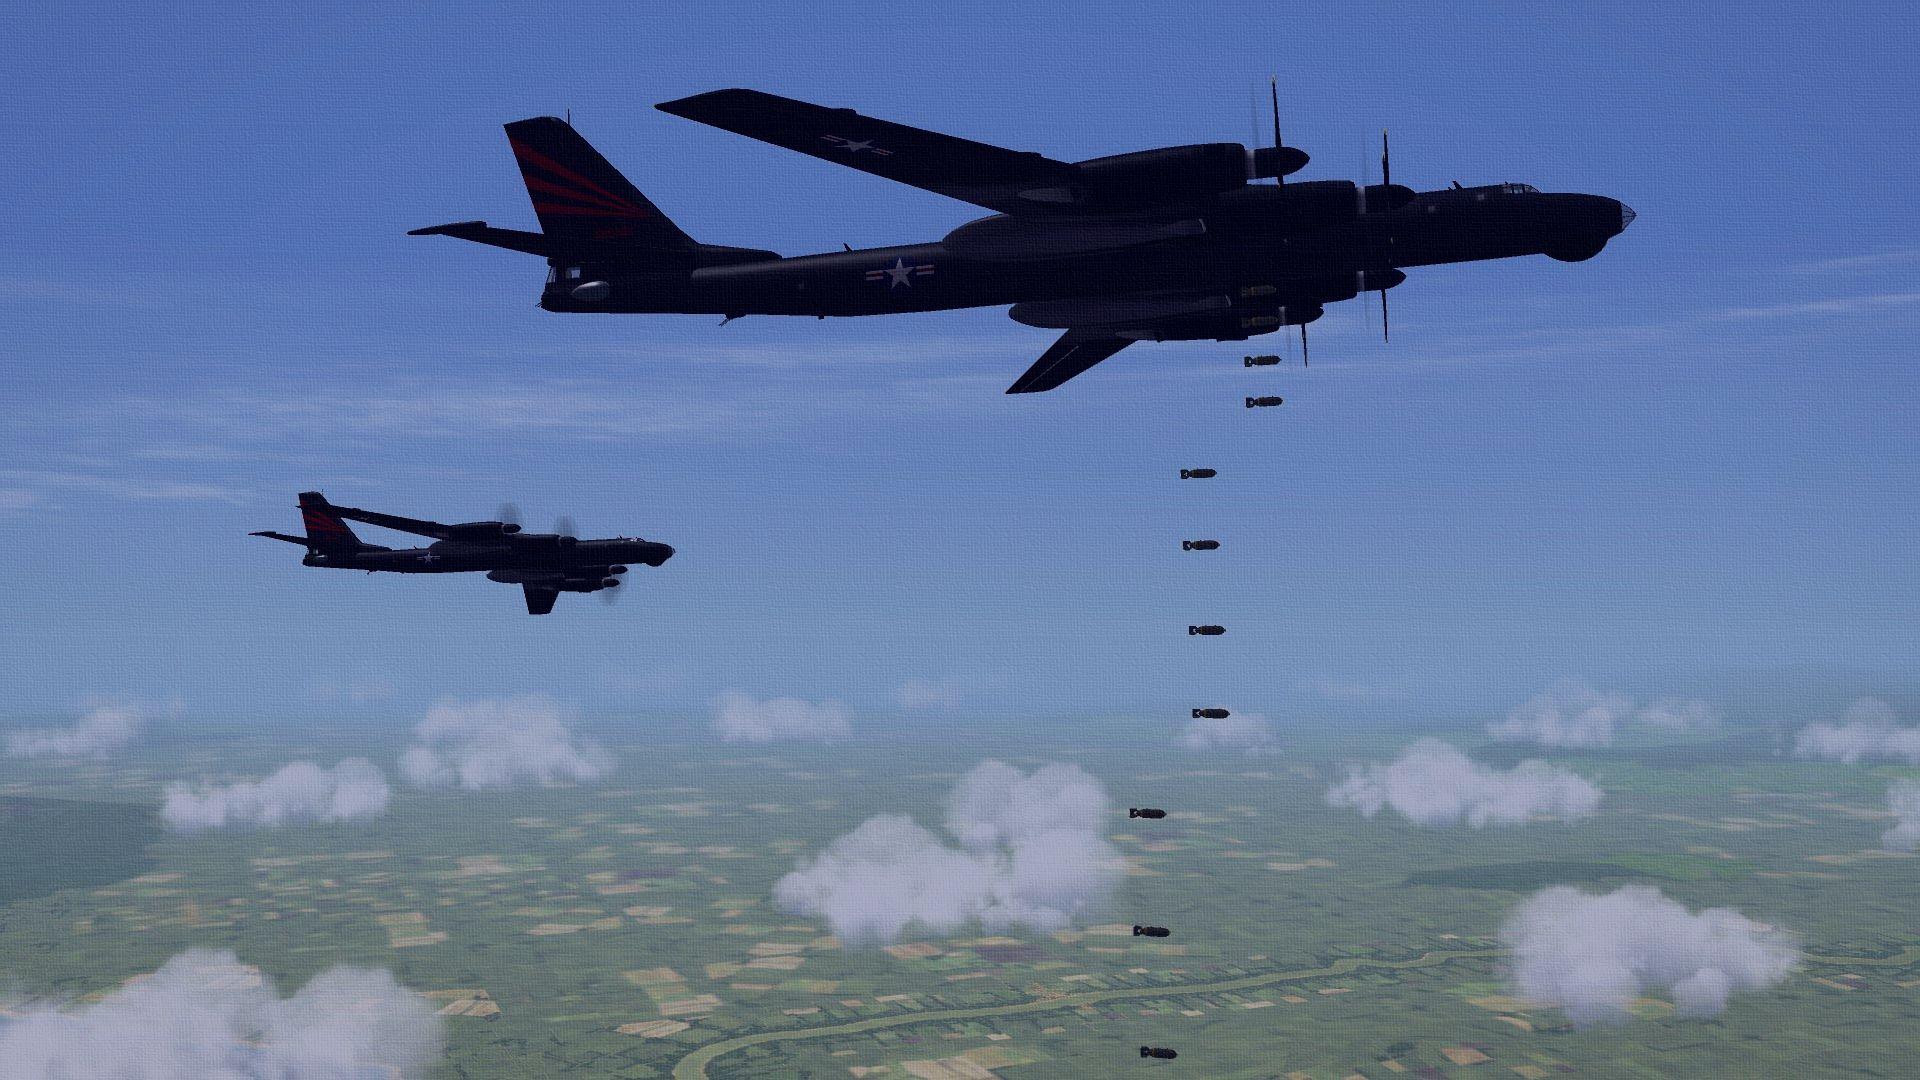 USAAFB-38BSTRATOBOMBER05_zps5dab4c95.jpg